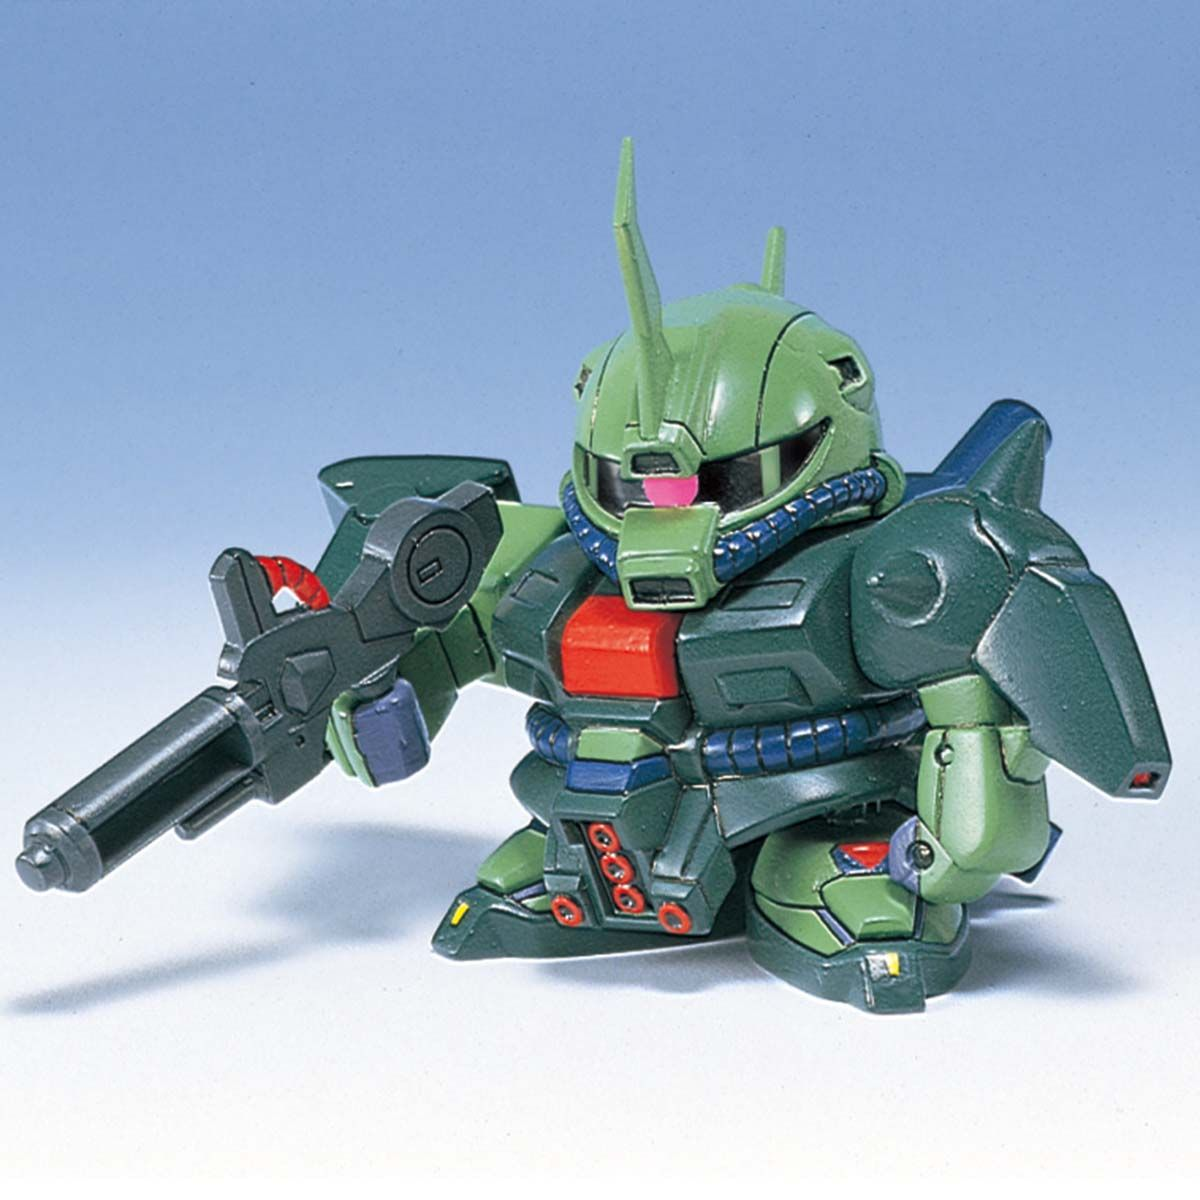 SDガンダム GジェネレーションZERO(GGENERATION-0) 008 AMX-011S ザクIII改 [Zaku III Custom]